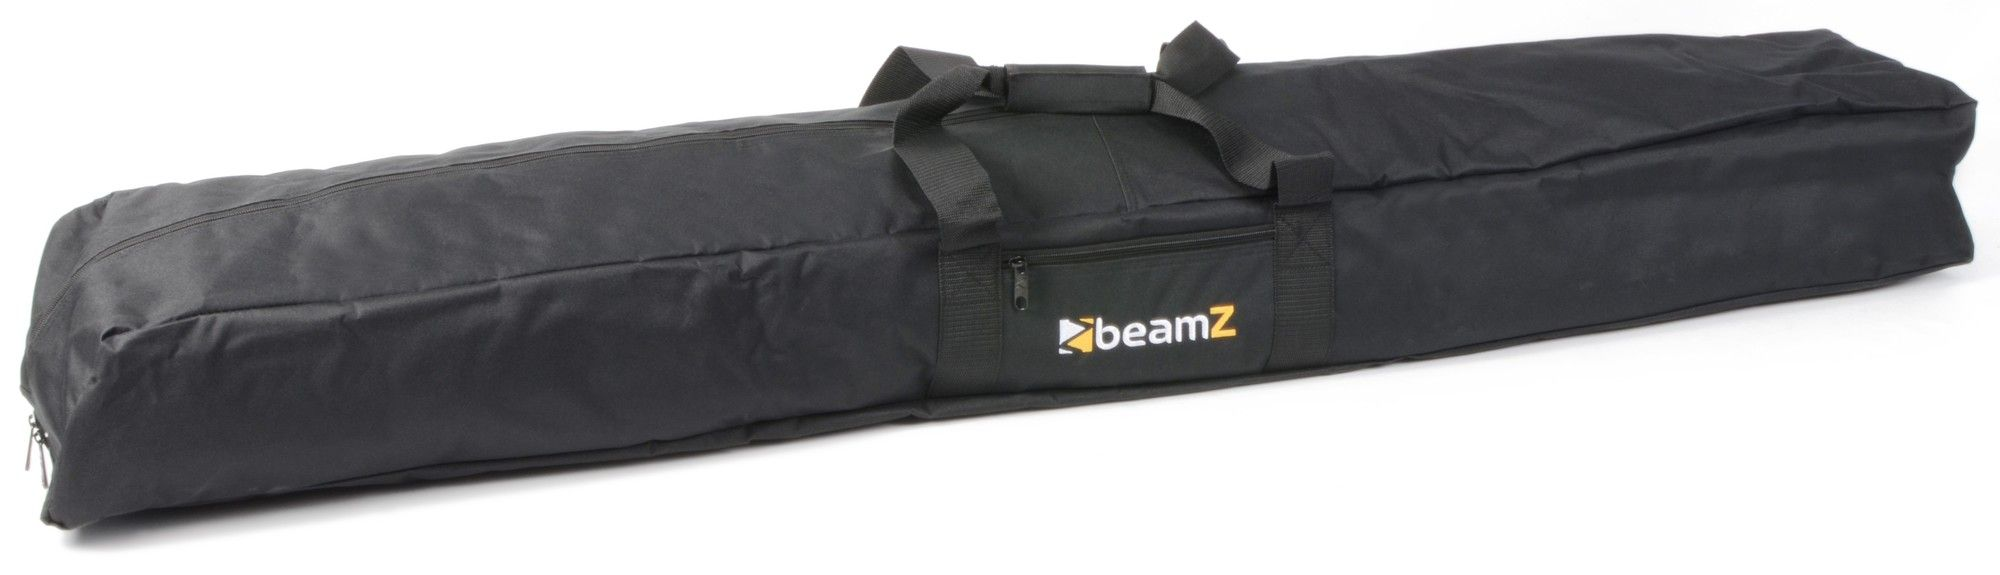 Afbeelding van 2e keus - Beamz AC-63 duo Tripod stand flightbag...